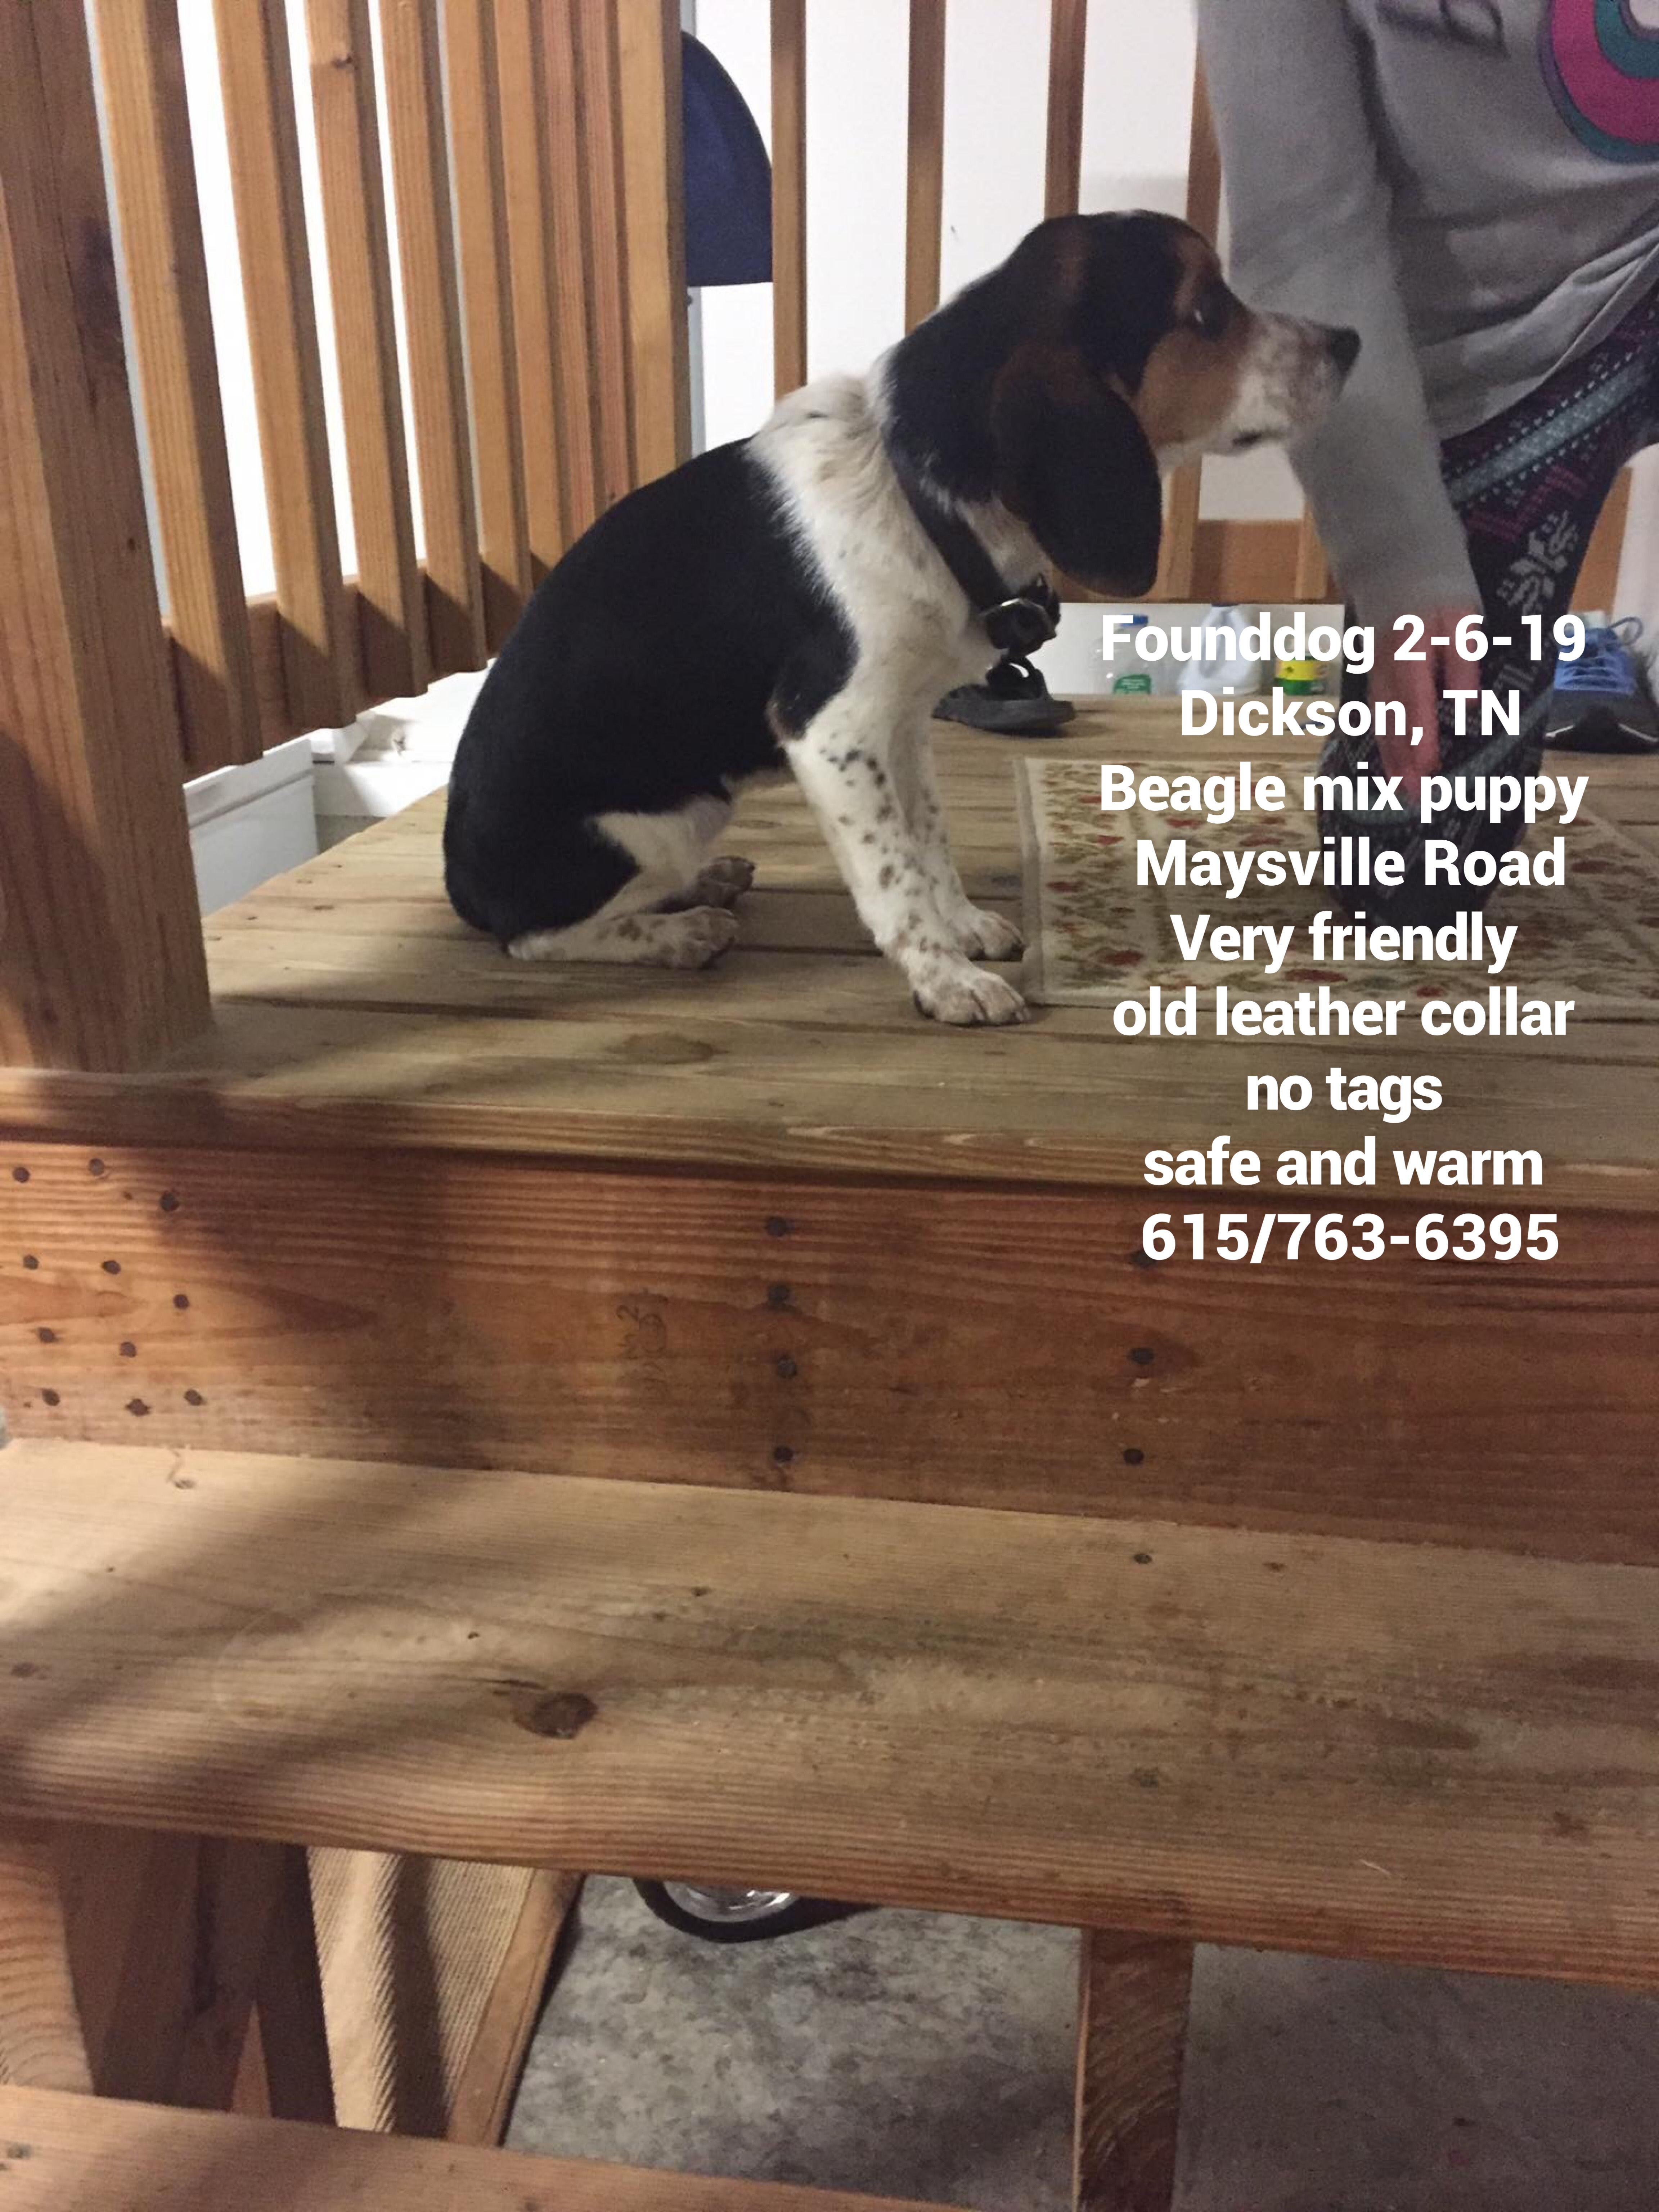 Founddog 2 6 19 Dickson Tn Beagle Mix Puppy Maysville Road Very